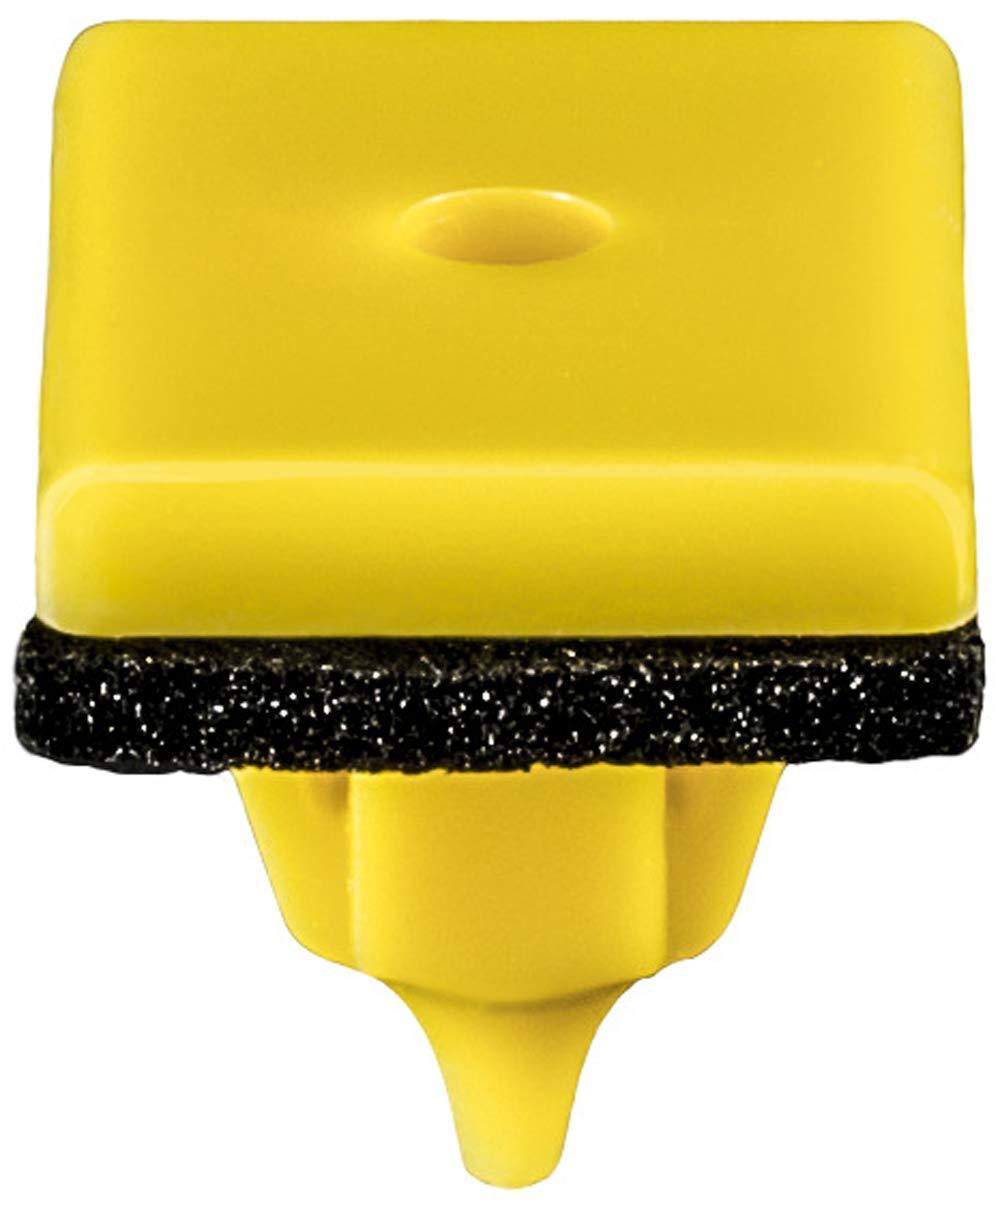 15 Rocker Moulding Grommet W//Sealer For Hyundai 87759-27000 Clipsandfasteners Inc